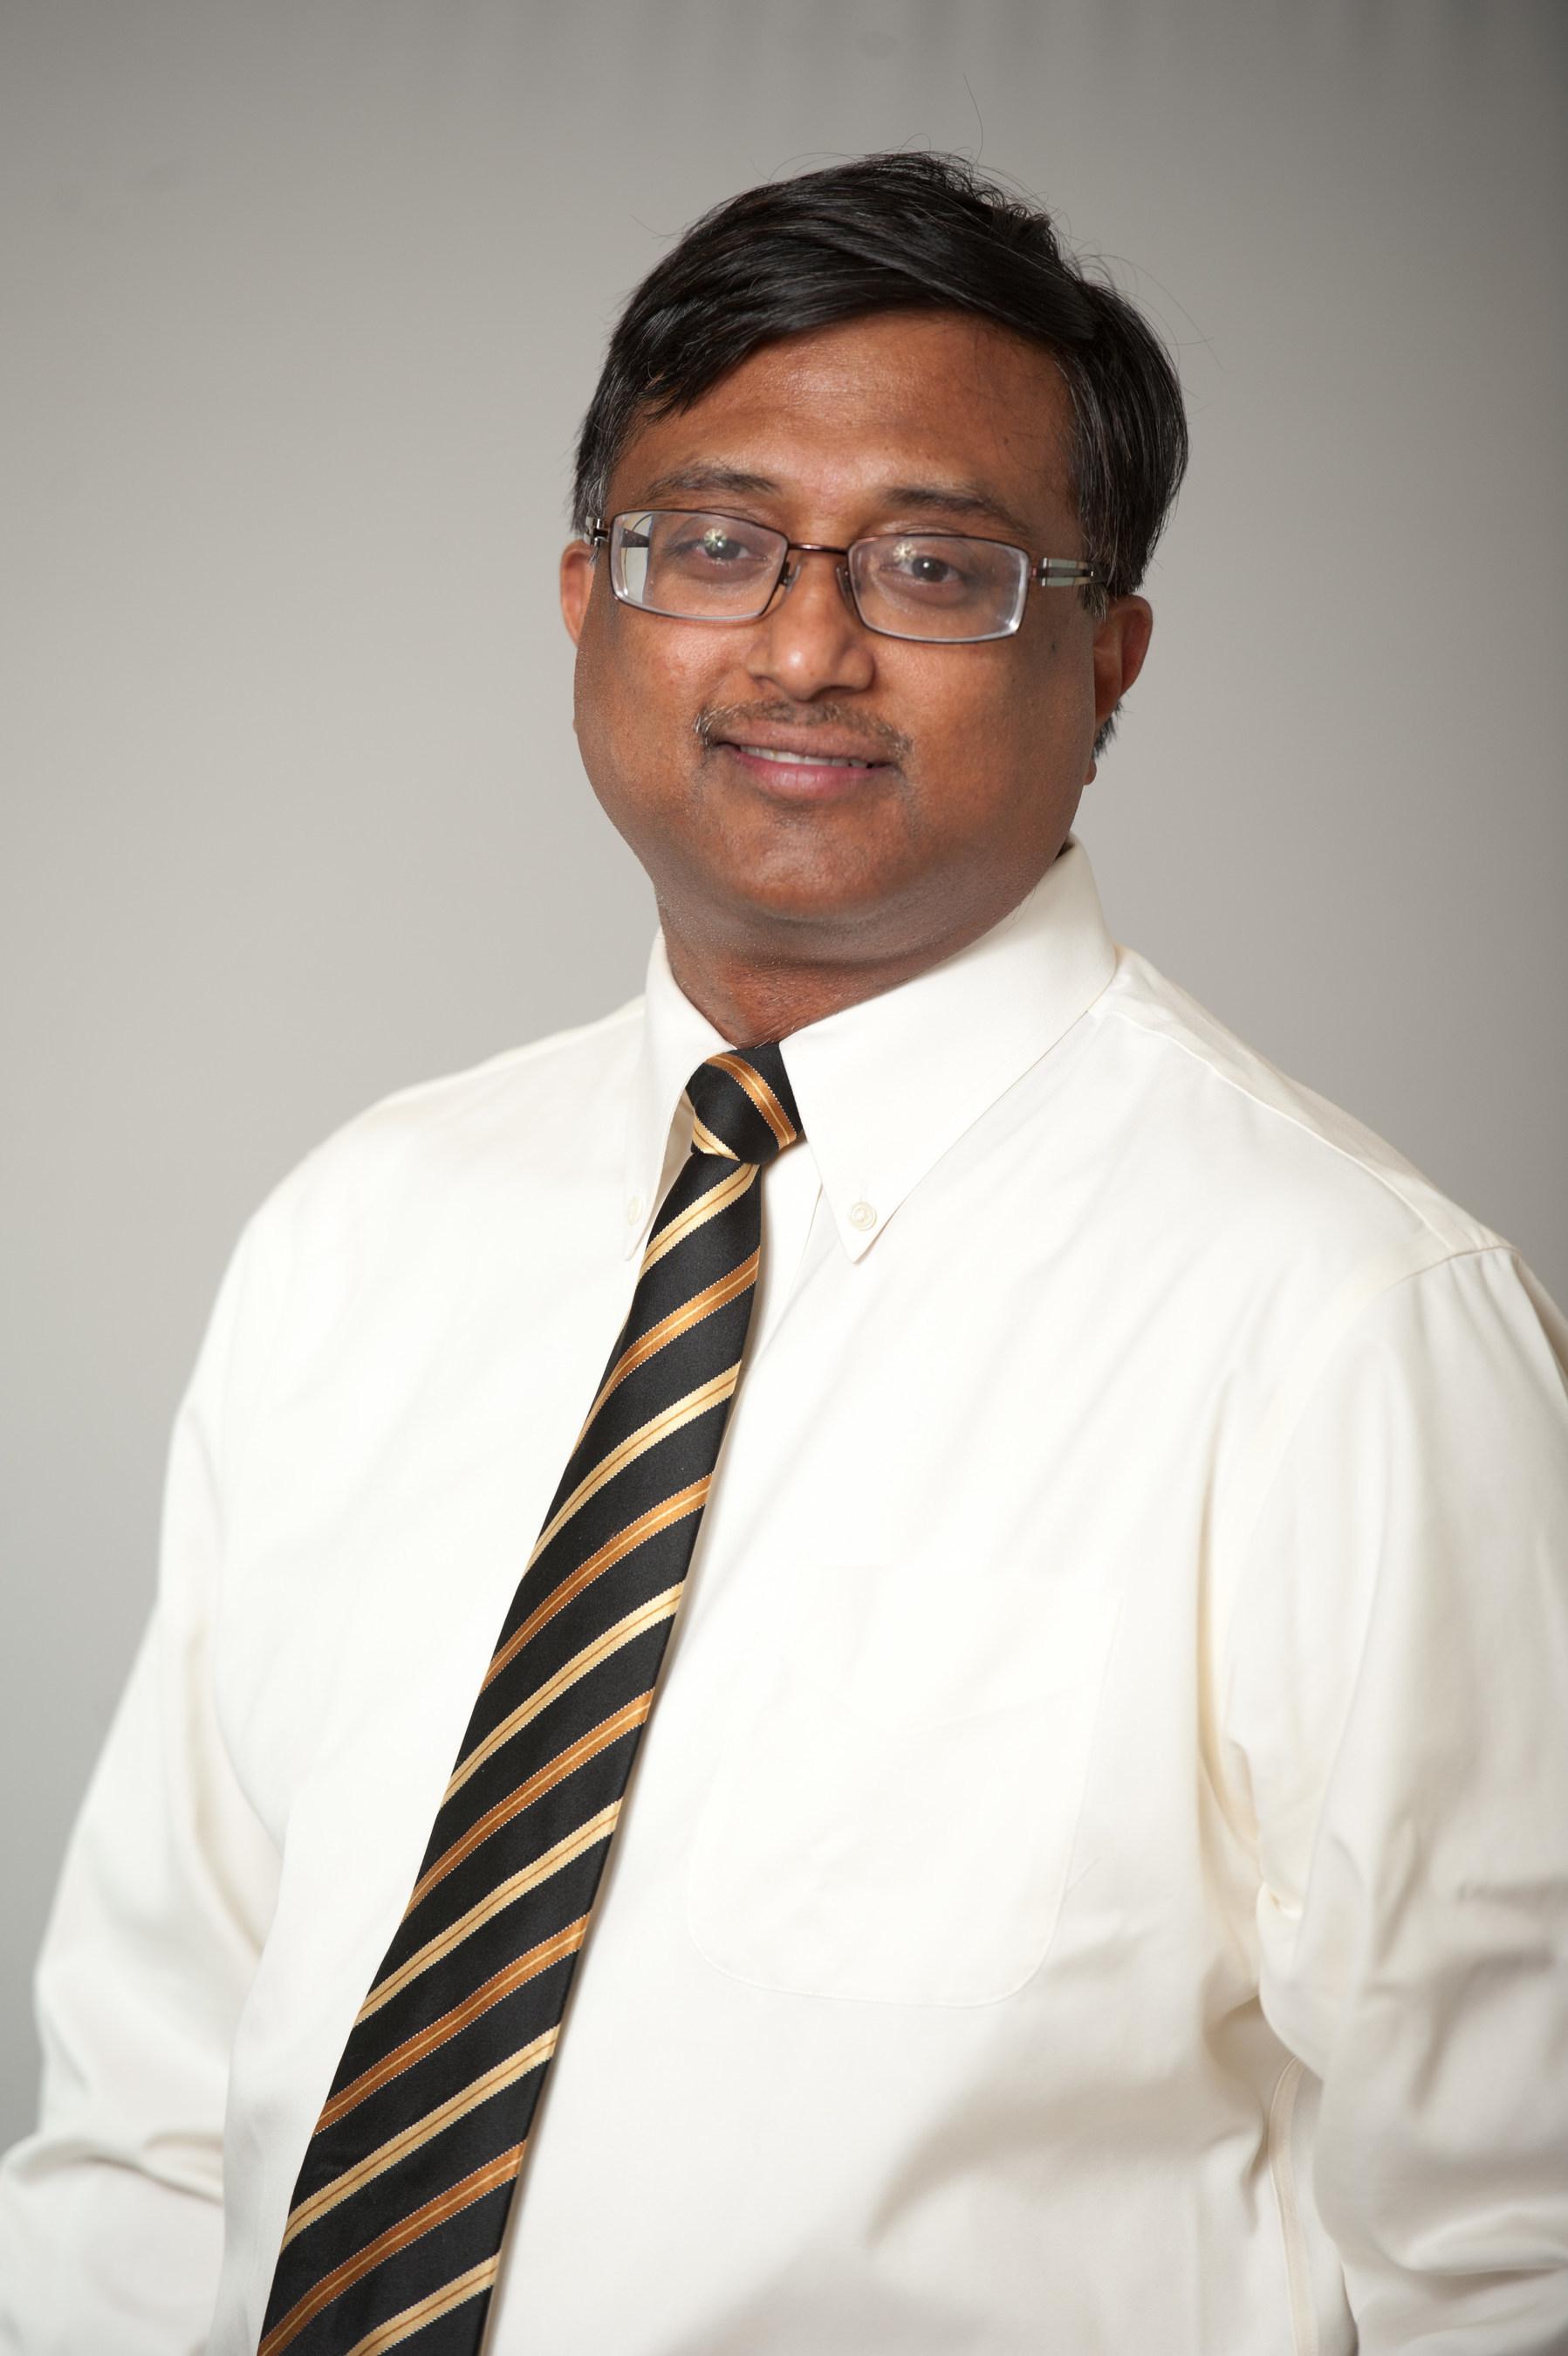 Chowdhury H. Ahsan, M.D., F.A.C.C. F.S.C.A.I.